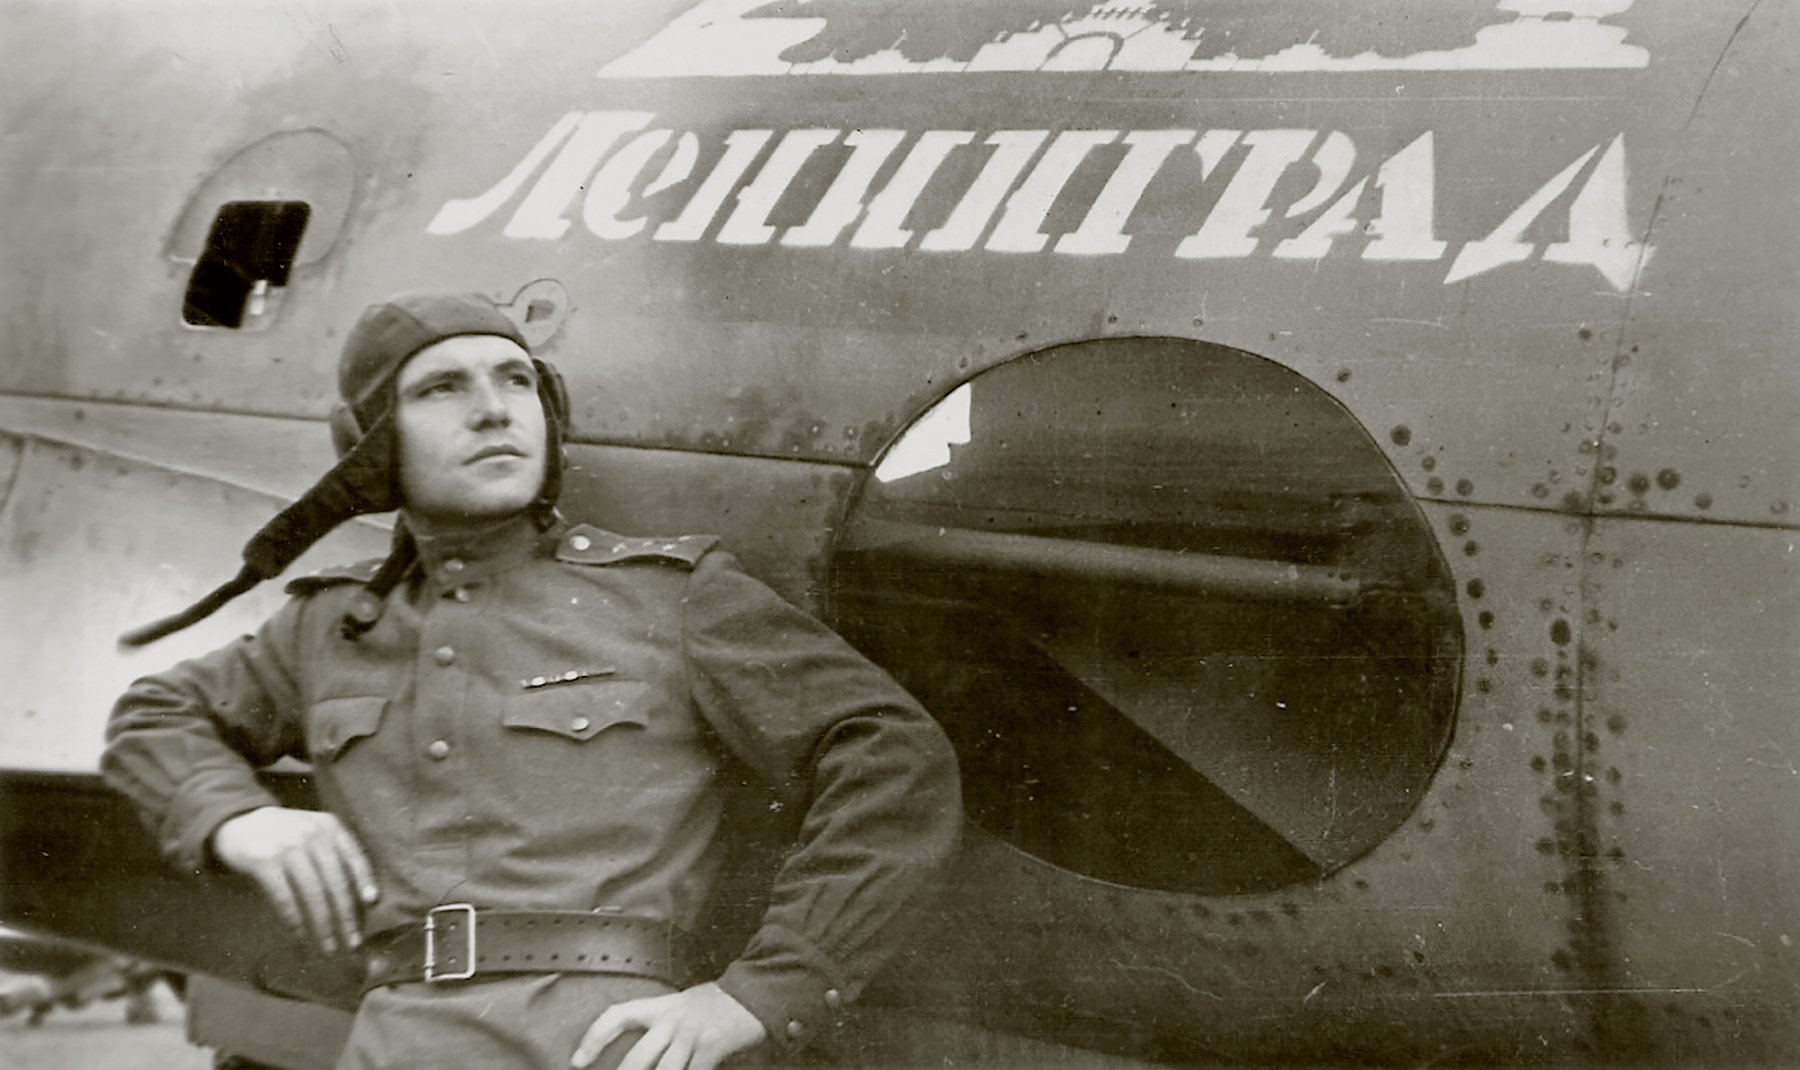 Petlyakov Pe 2 type 110 34GvBAP from workers of Leningrad Borisov A Vasilyevich 1943 01